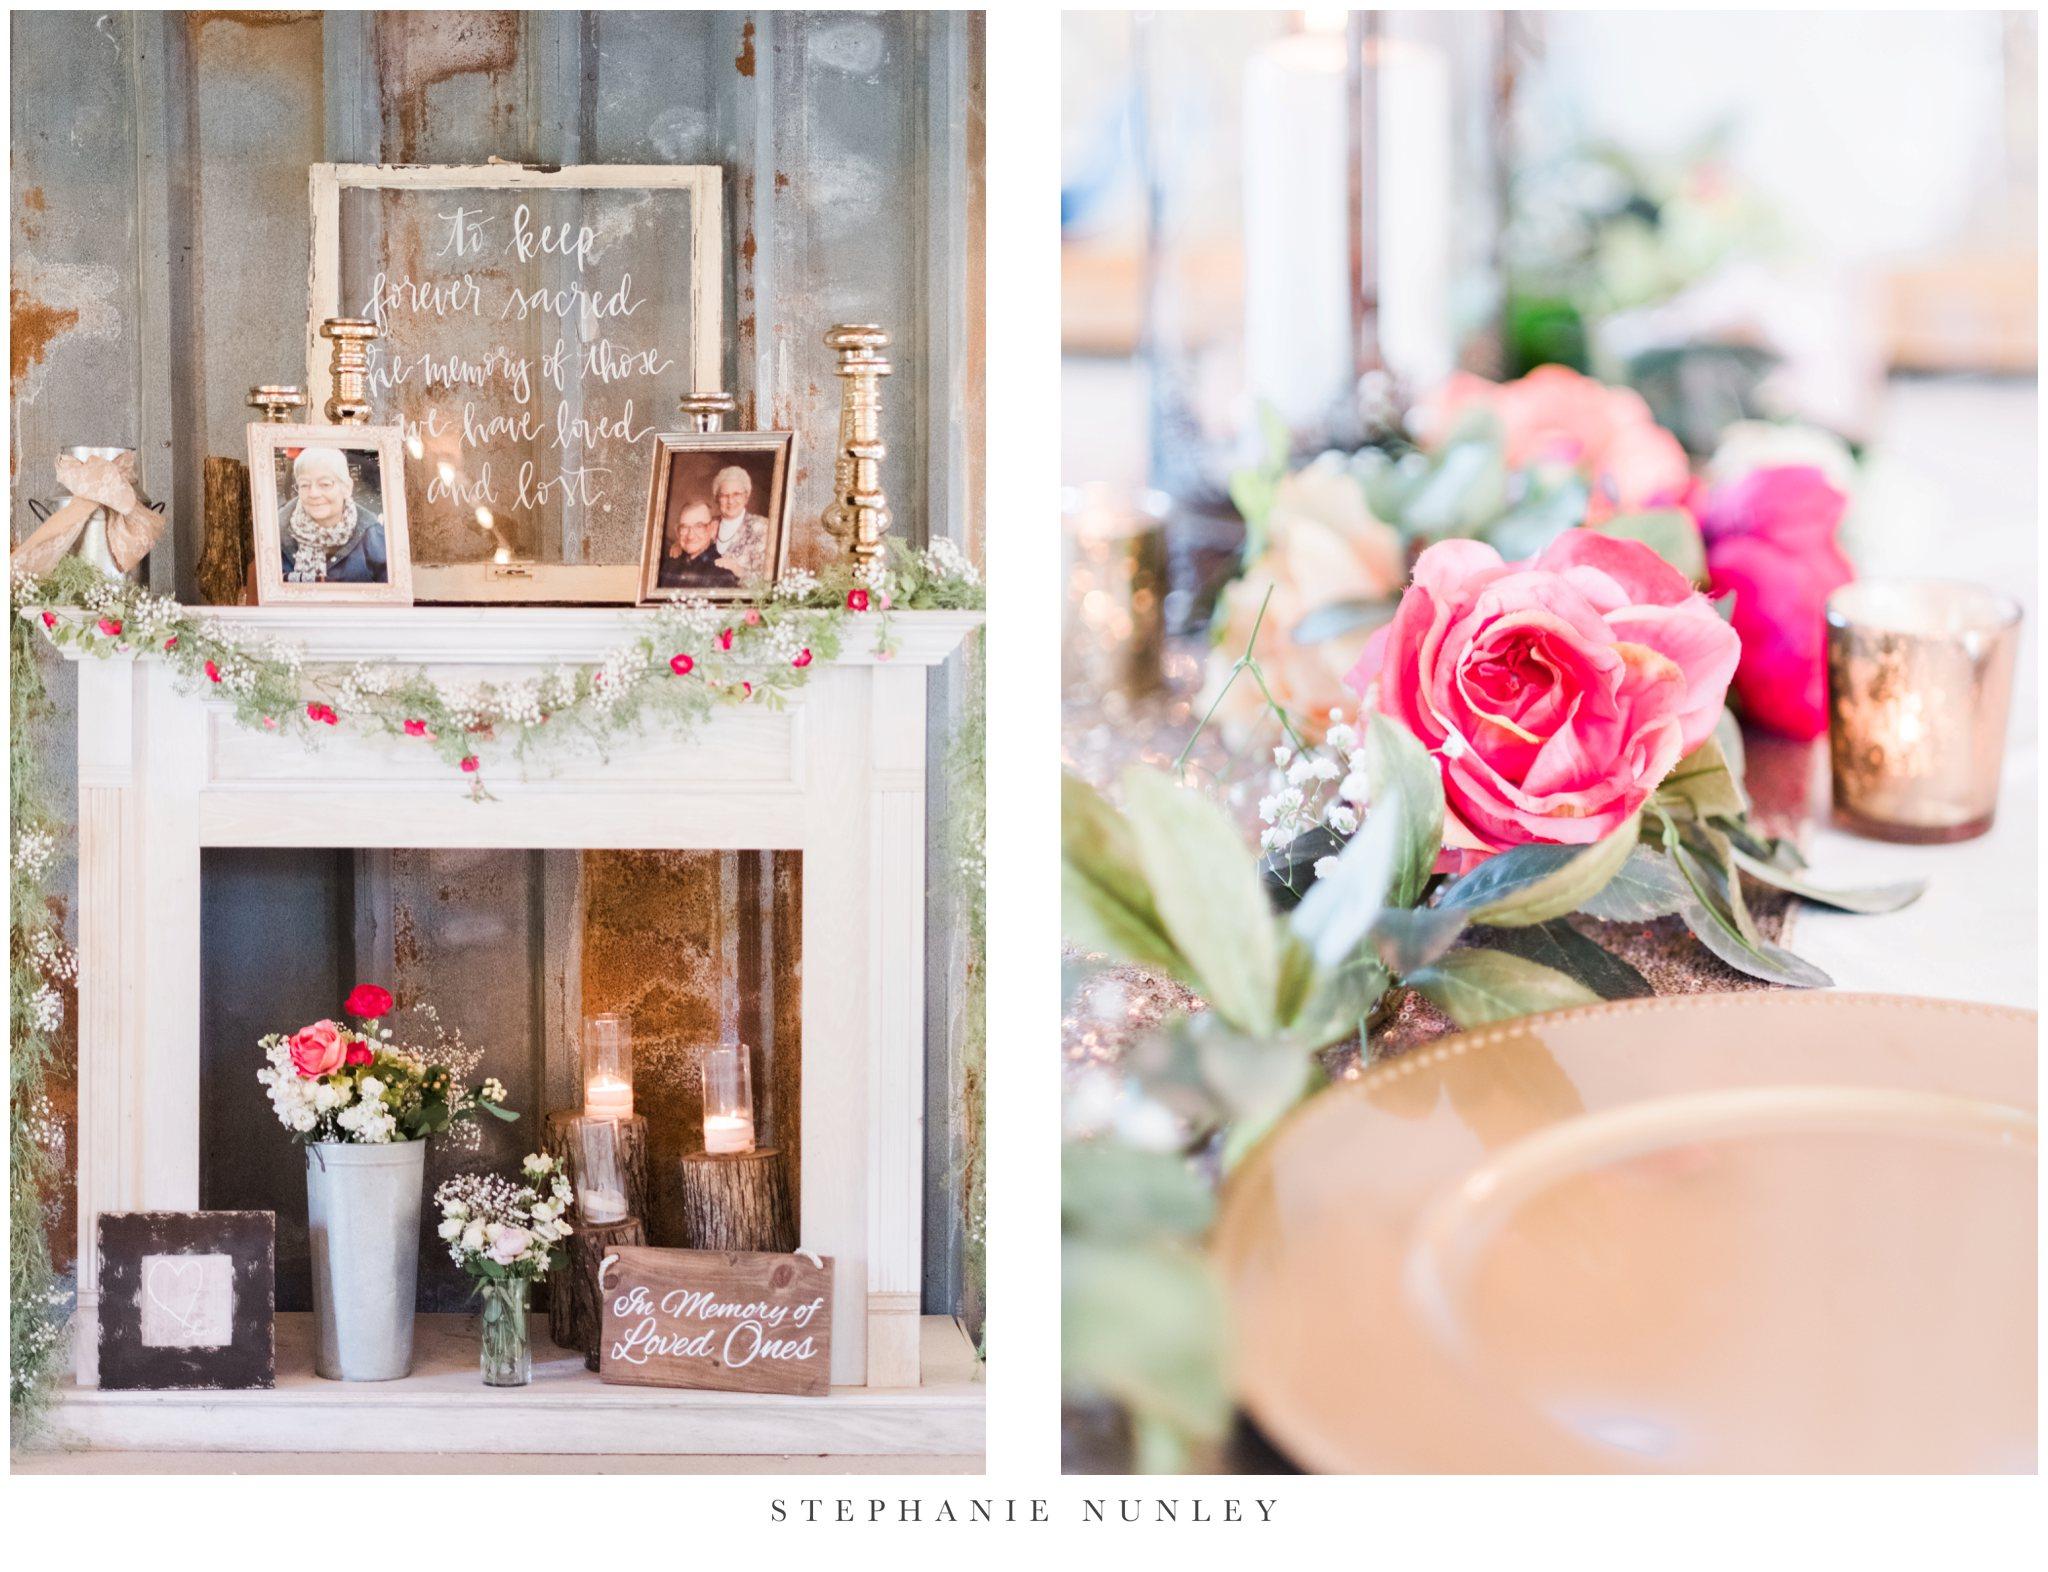 romantic-outdoor-wedding-with-flower-crown-0120.jpg